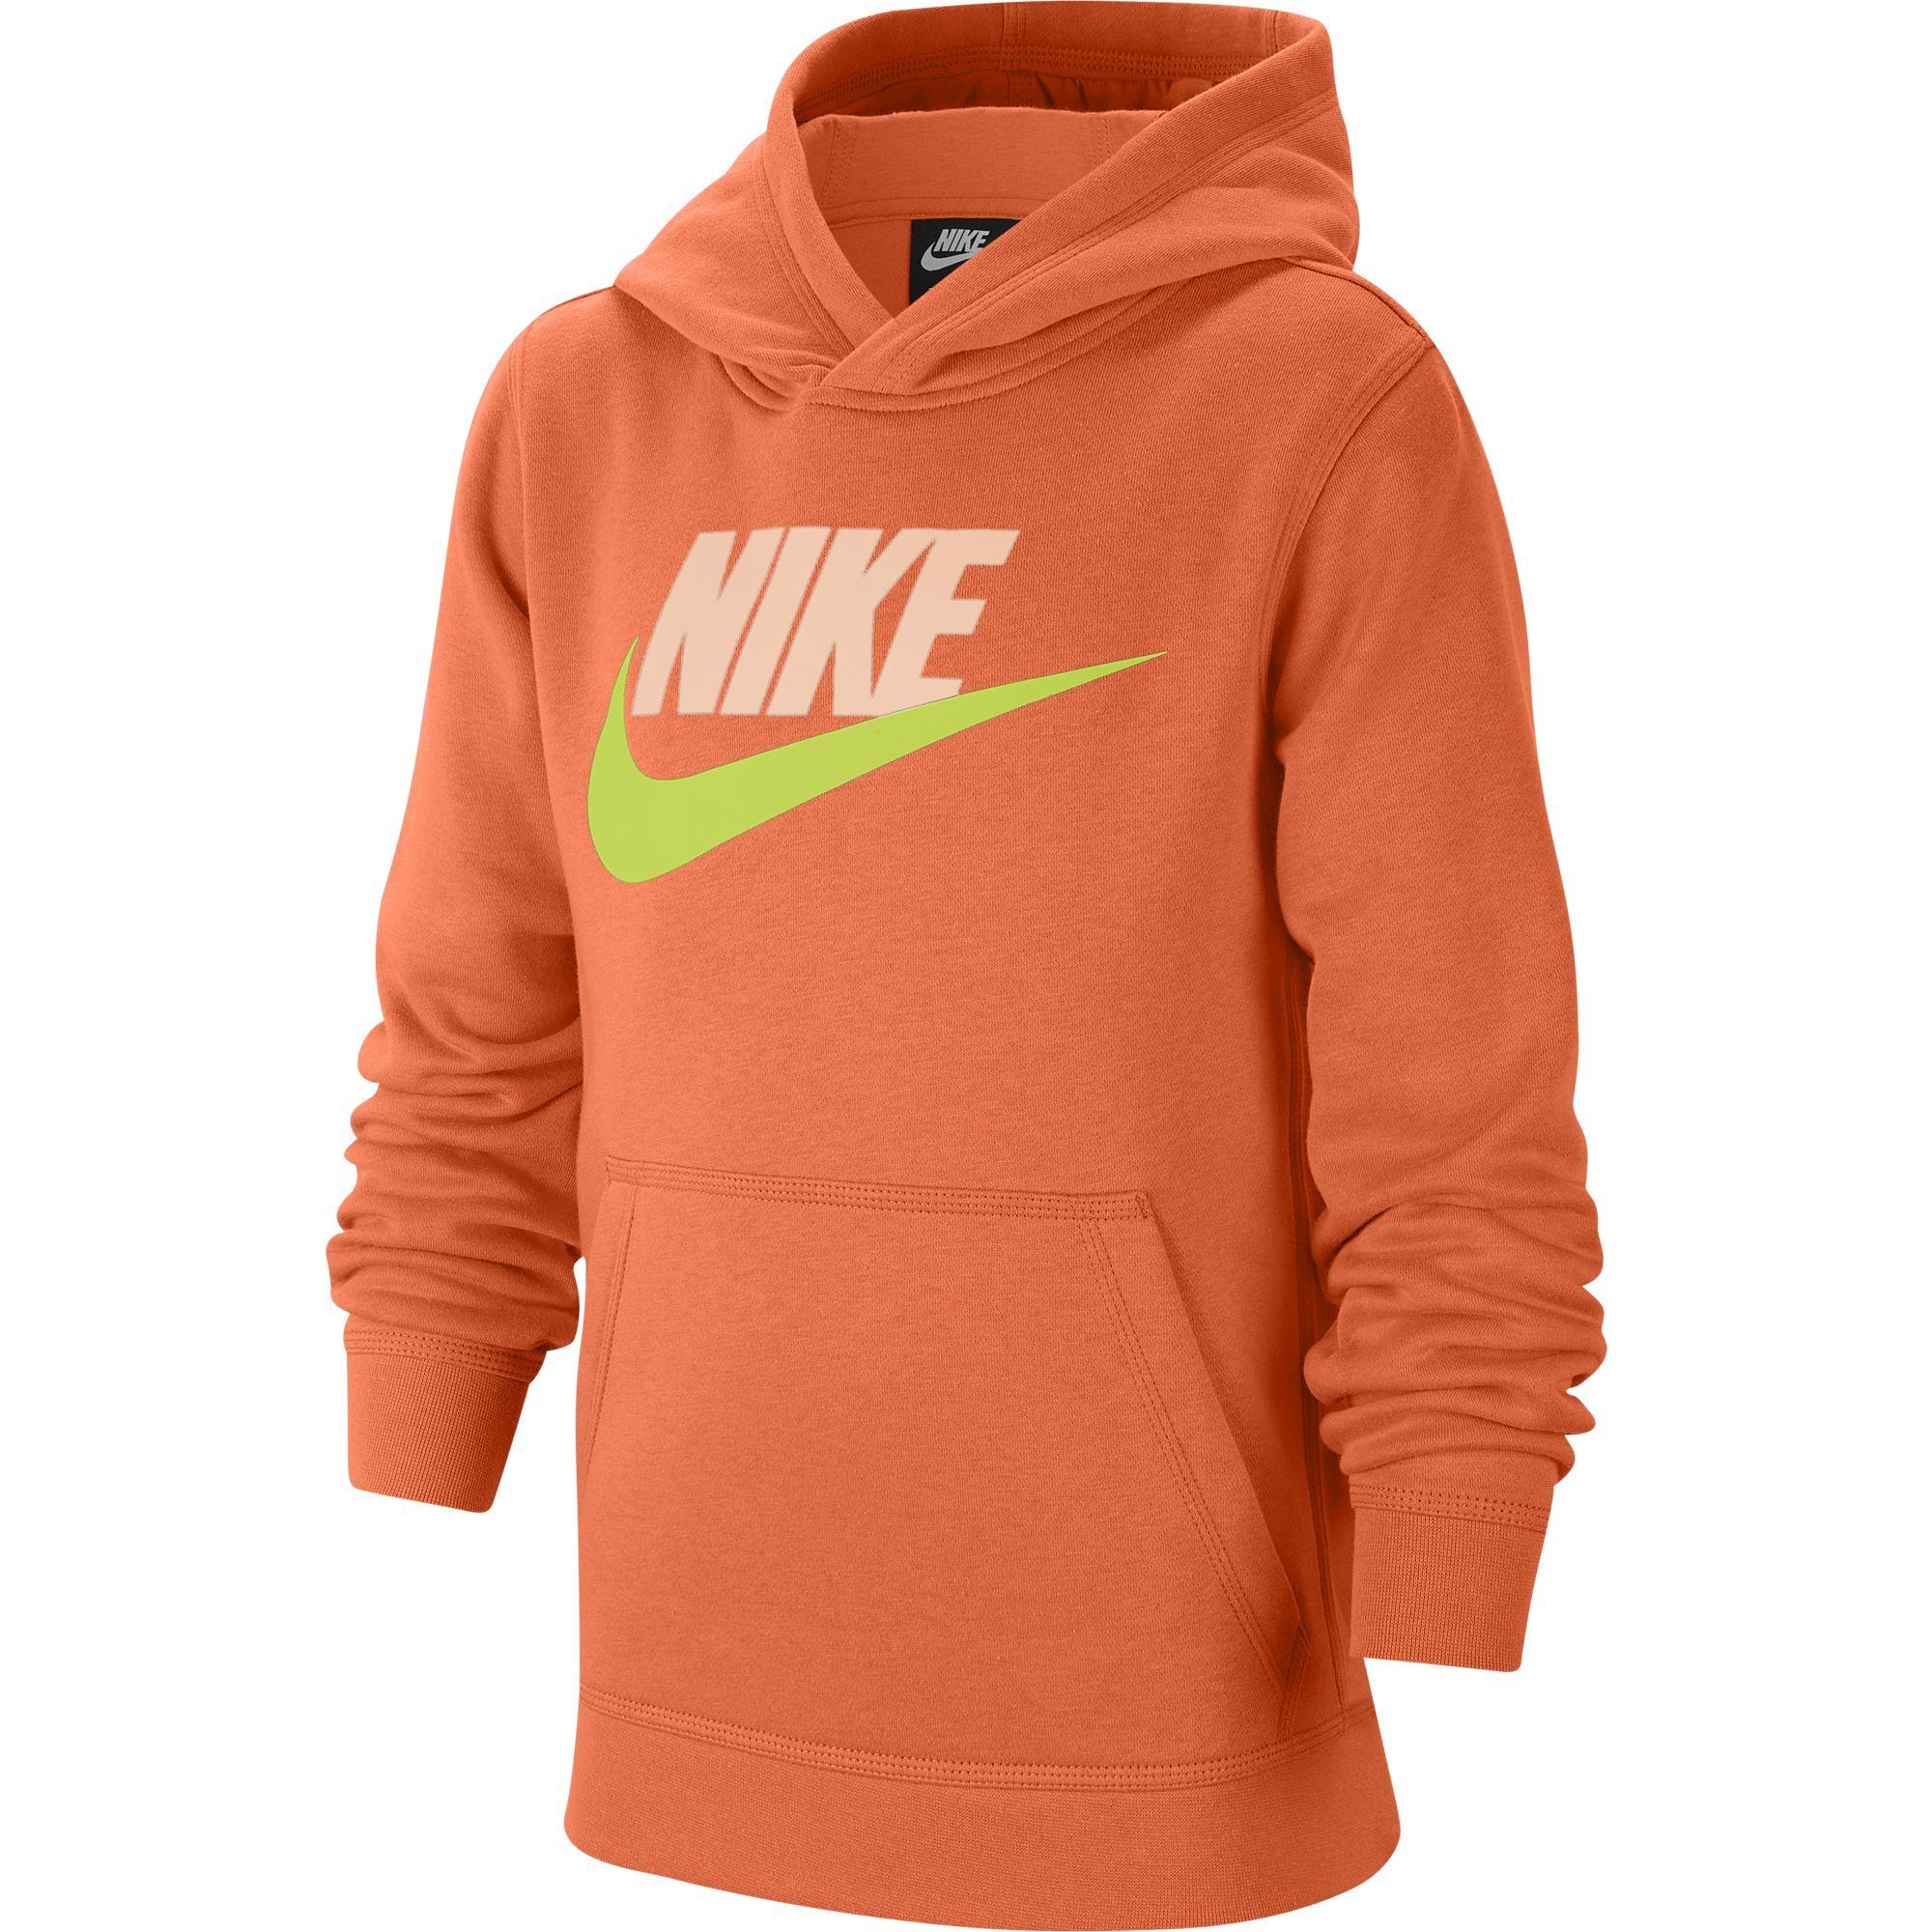 Boys' Sportswear Club Fleece, Orange, swatch